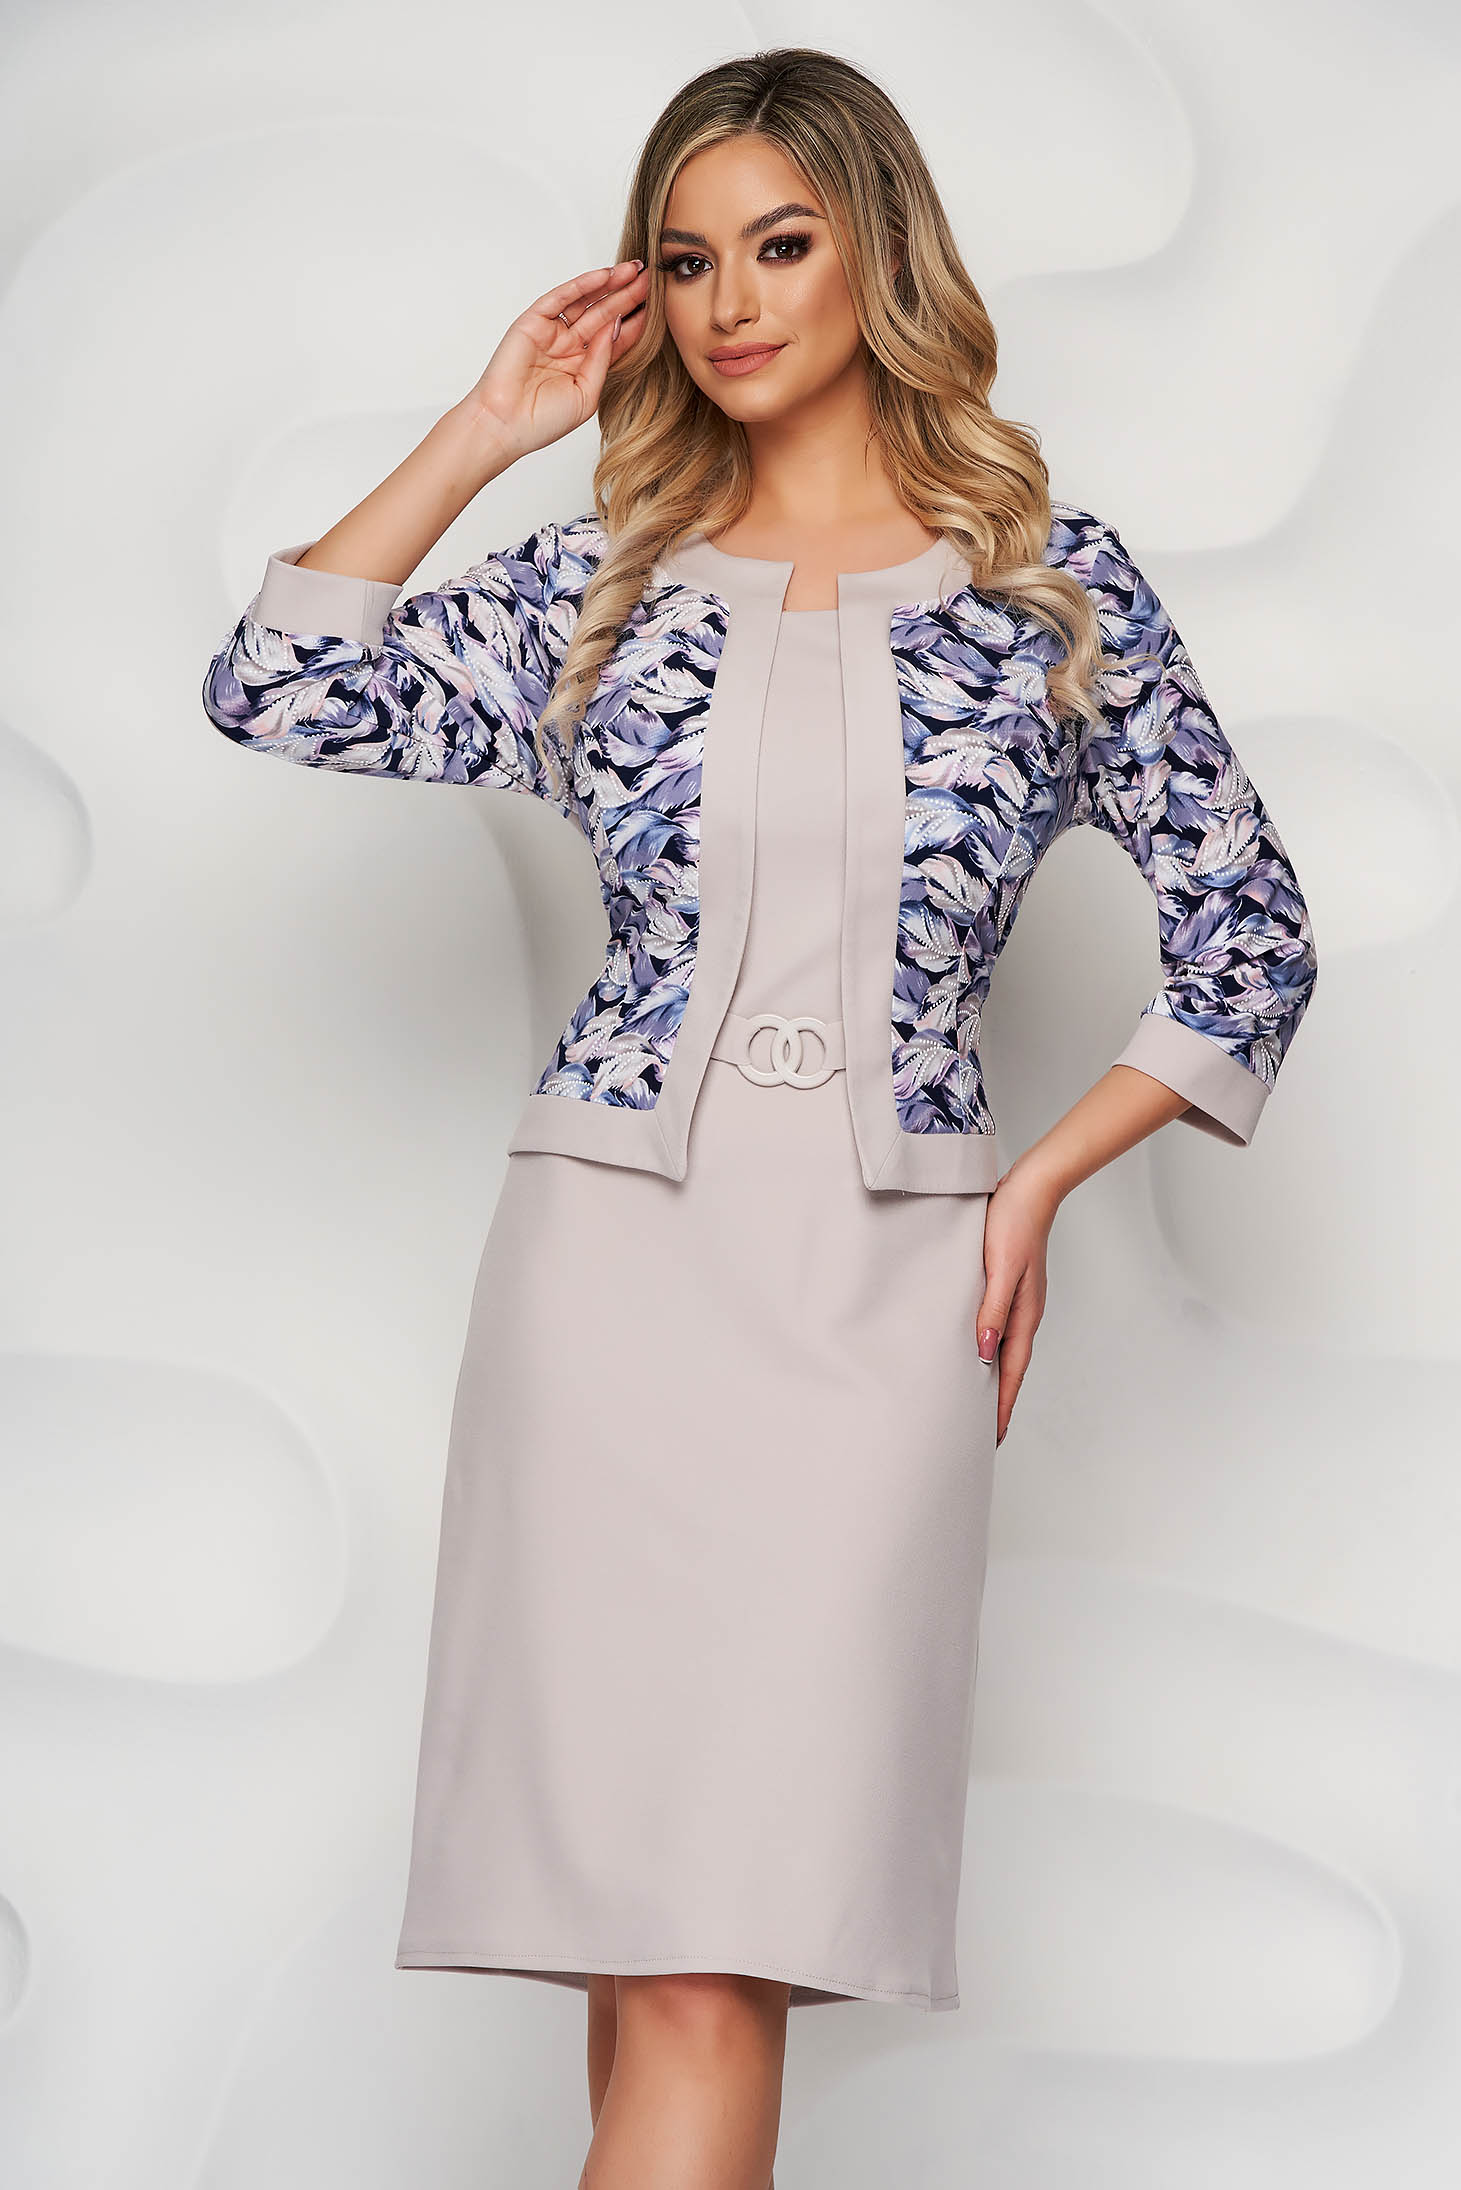 Cream dress pencil slightly elastic fabric elegant midi accessorized with belt